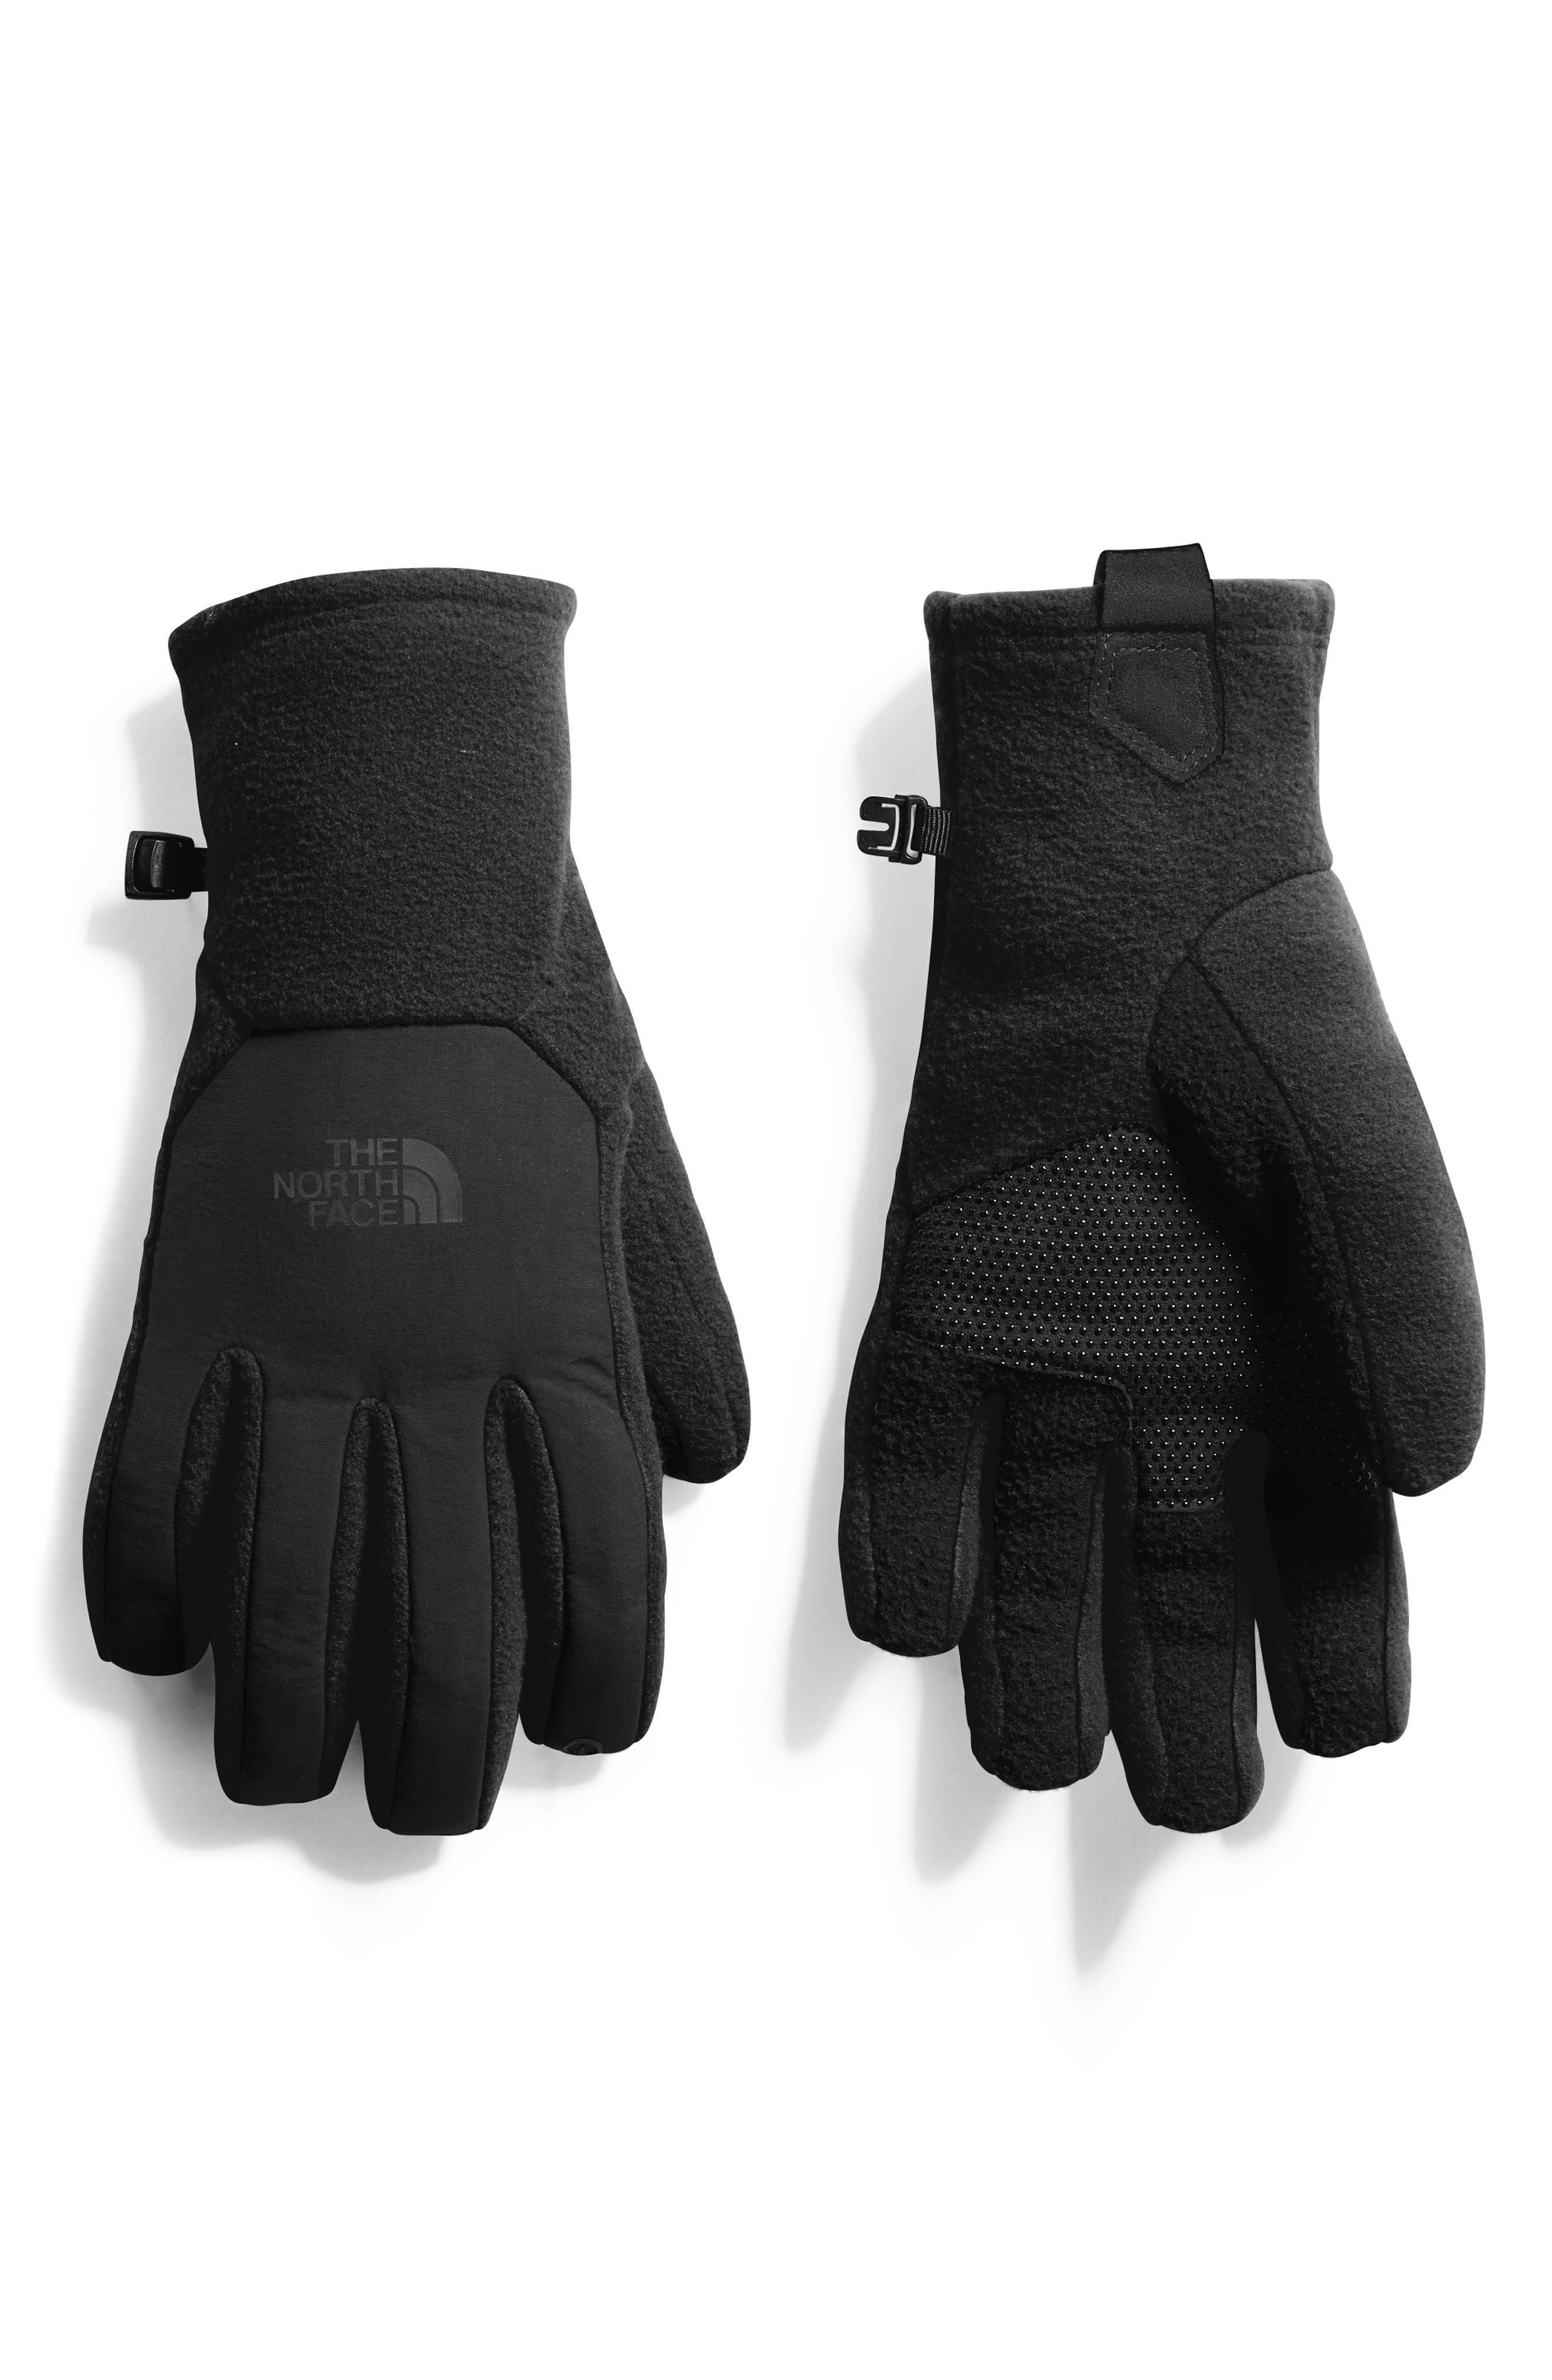 THE NORTH FACE, Denali Thermal Etip<sup>™</sup> Gloves, Main thumbnail 1, color, BLACK